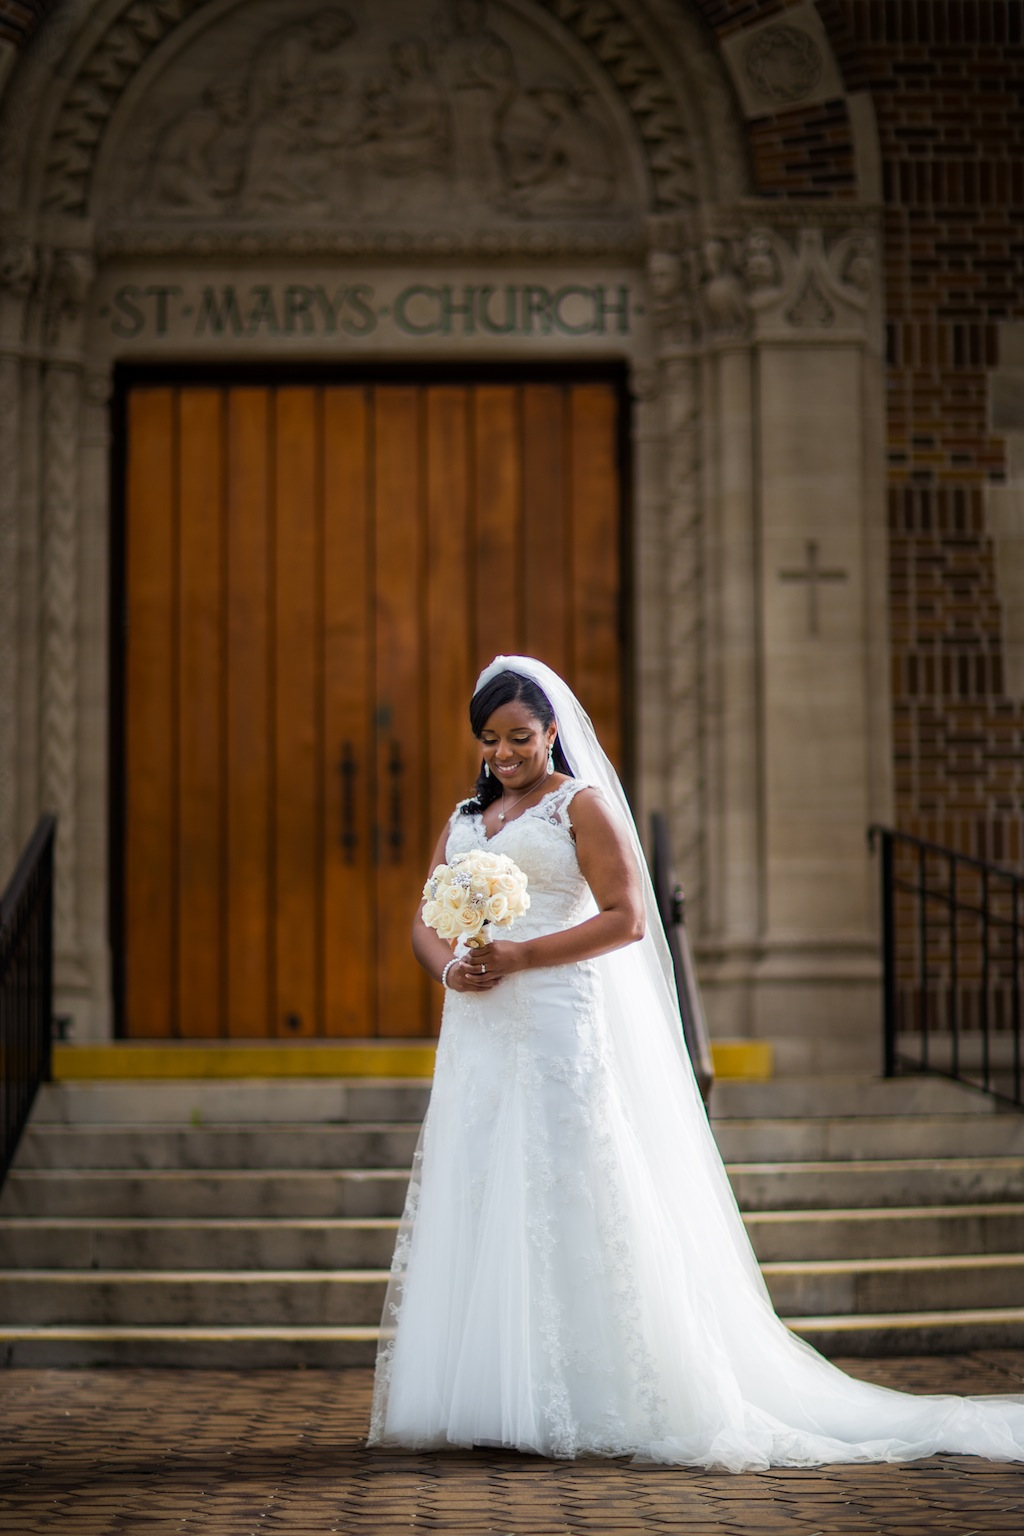 NOVA 535 Wedding - Midsummer Night's Dream Wedding in Downtown St. Pete by 28Pixels Photography (16)